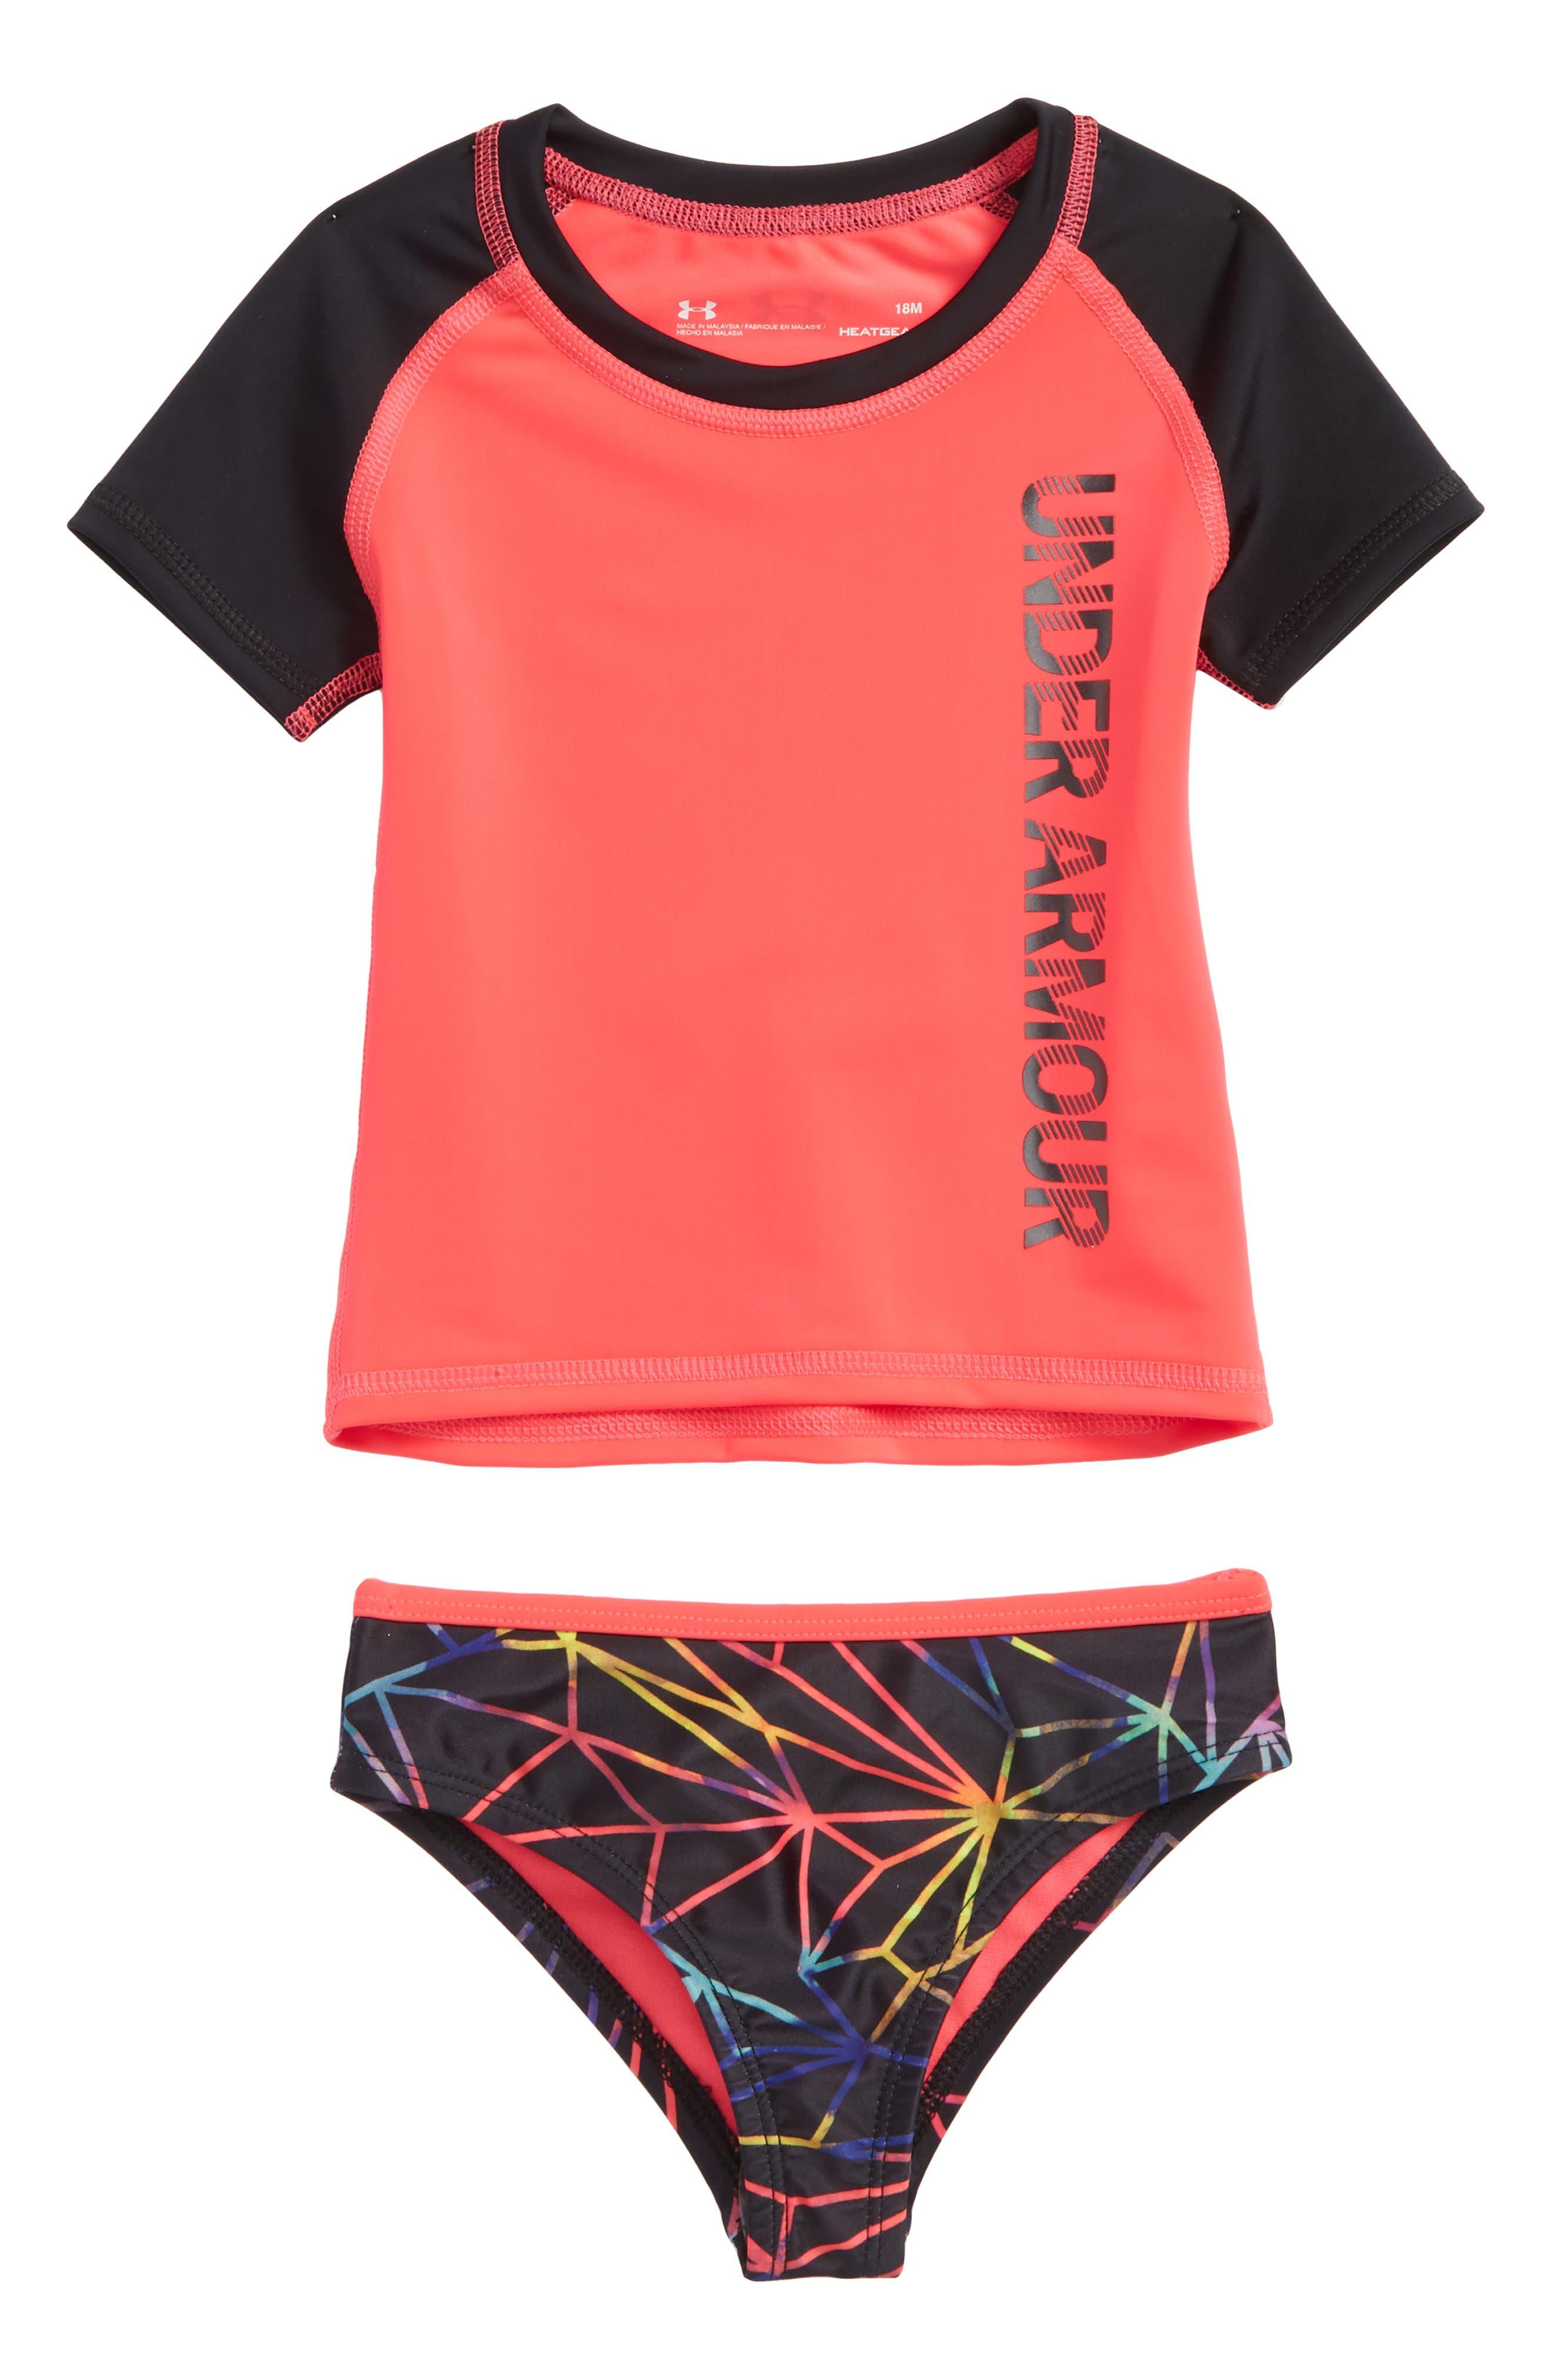 Main Image - Under Armour Poly Prism HeatGear® Two-Piece Rashguard Swimsuit (Baby Girls)